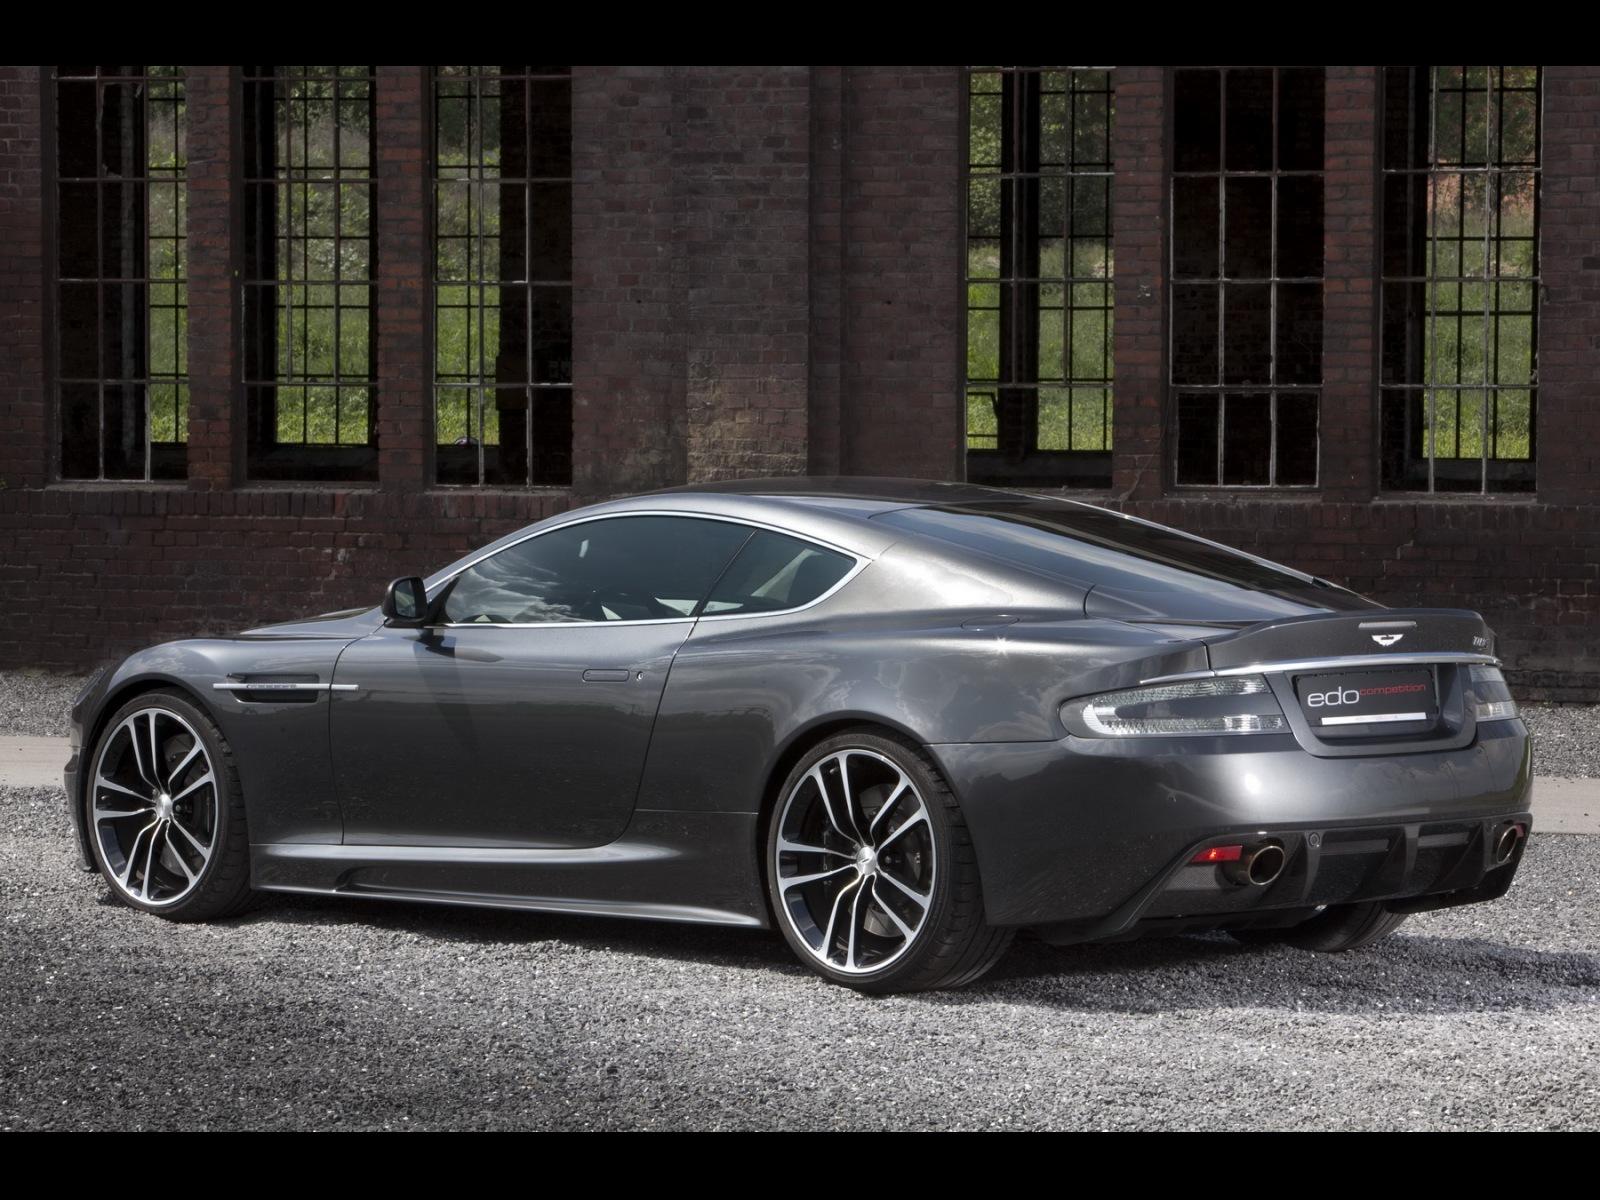 edo competition Aston Martin DB9 photos and wallpapers   tuningnews 1600x1200